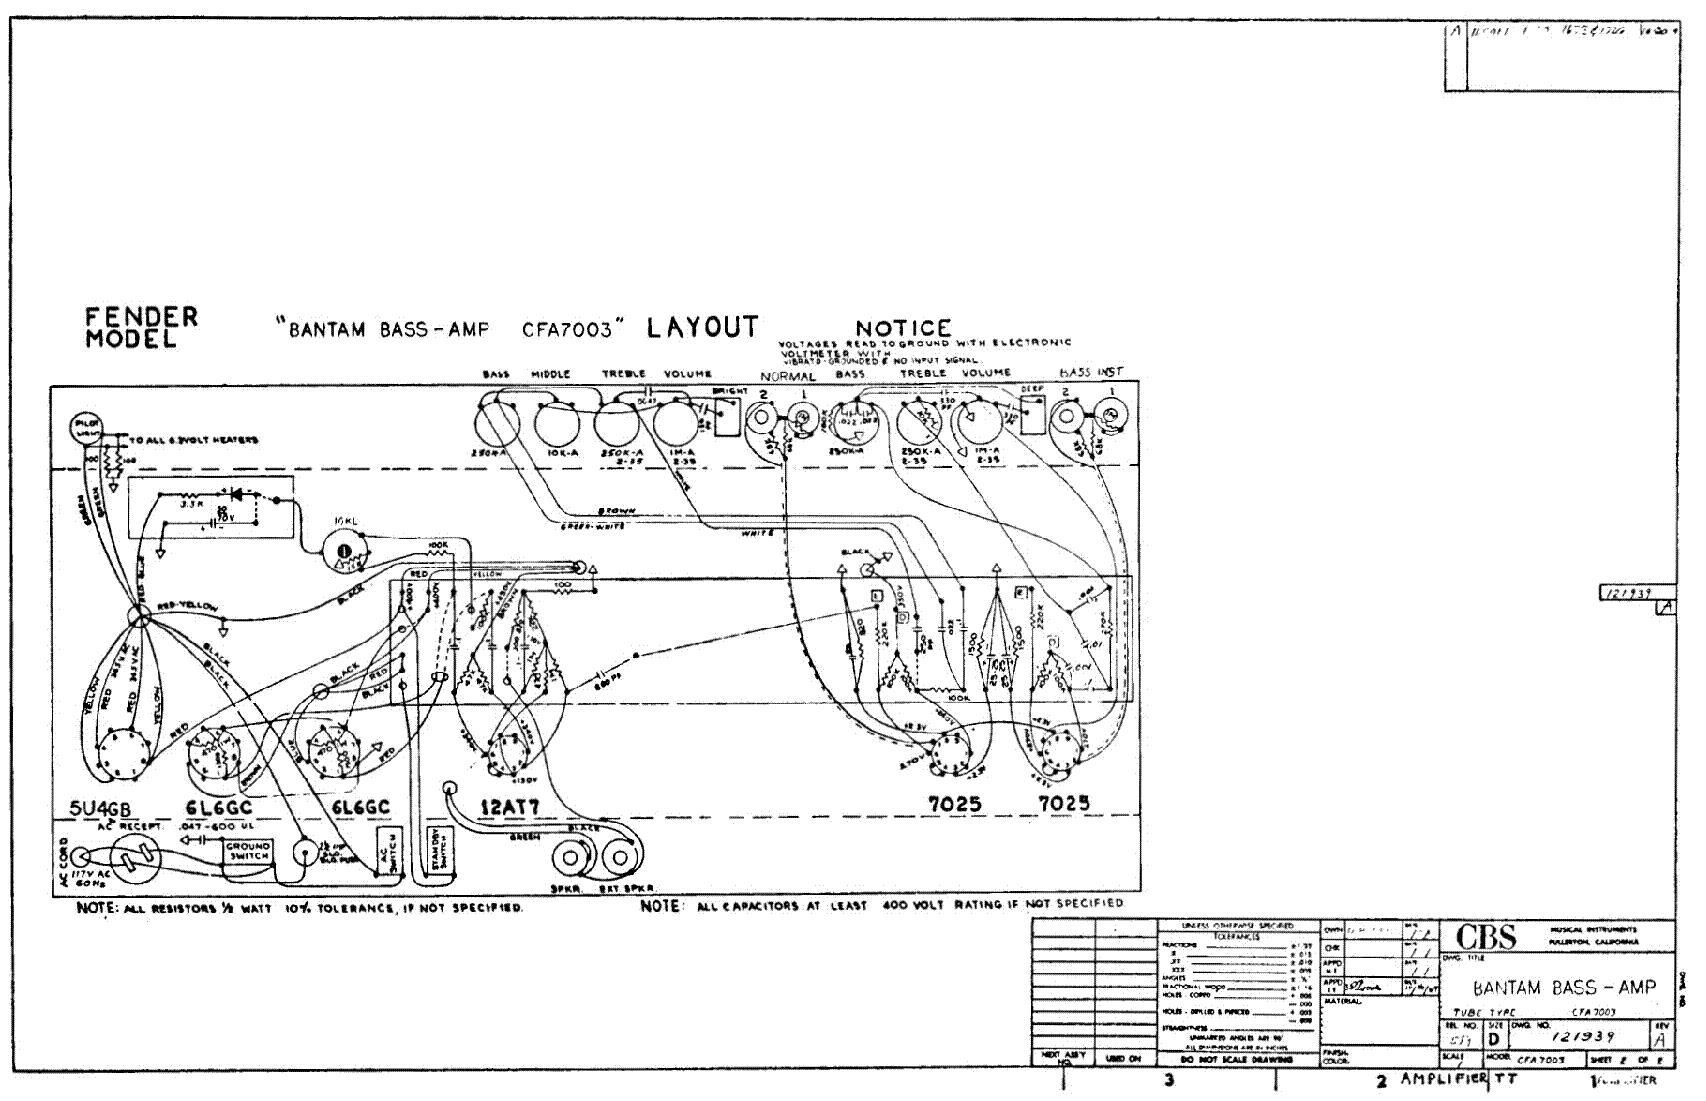 bass audio lbrary document pdf